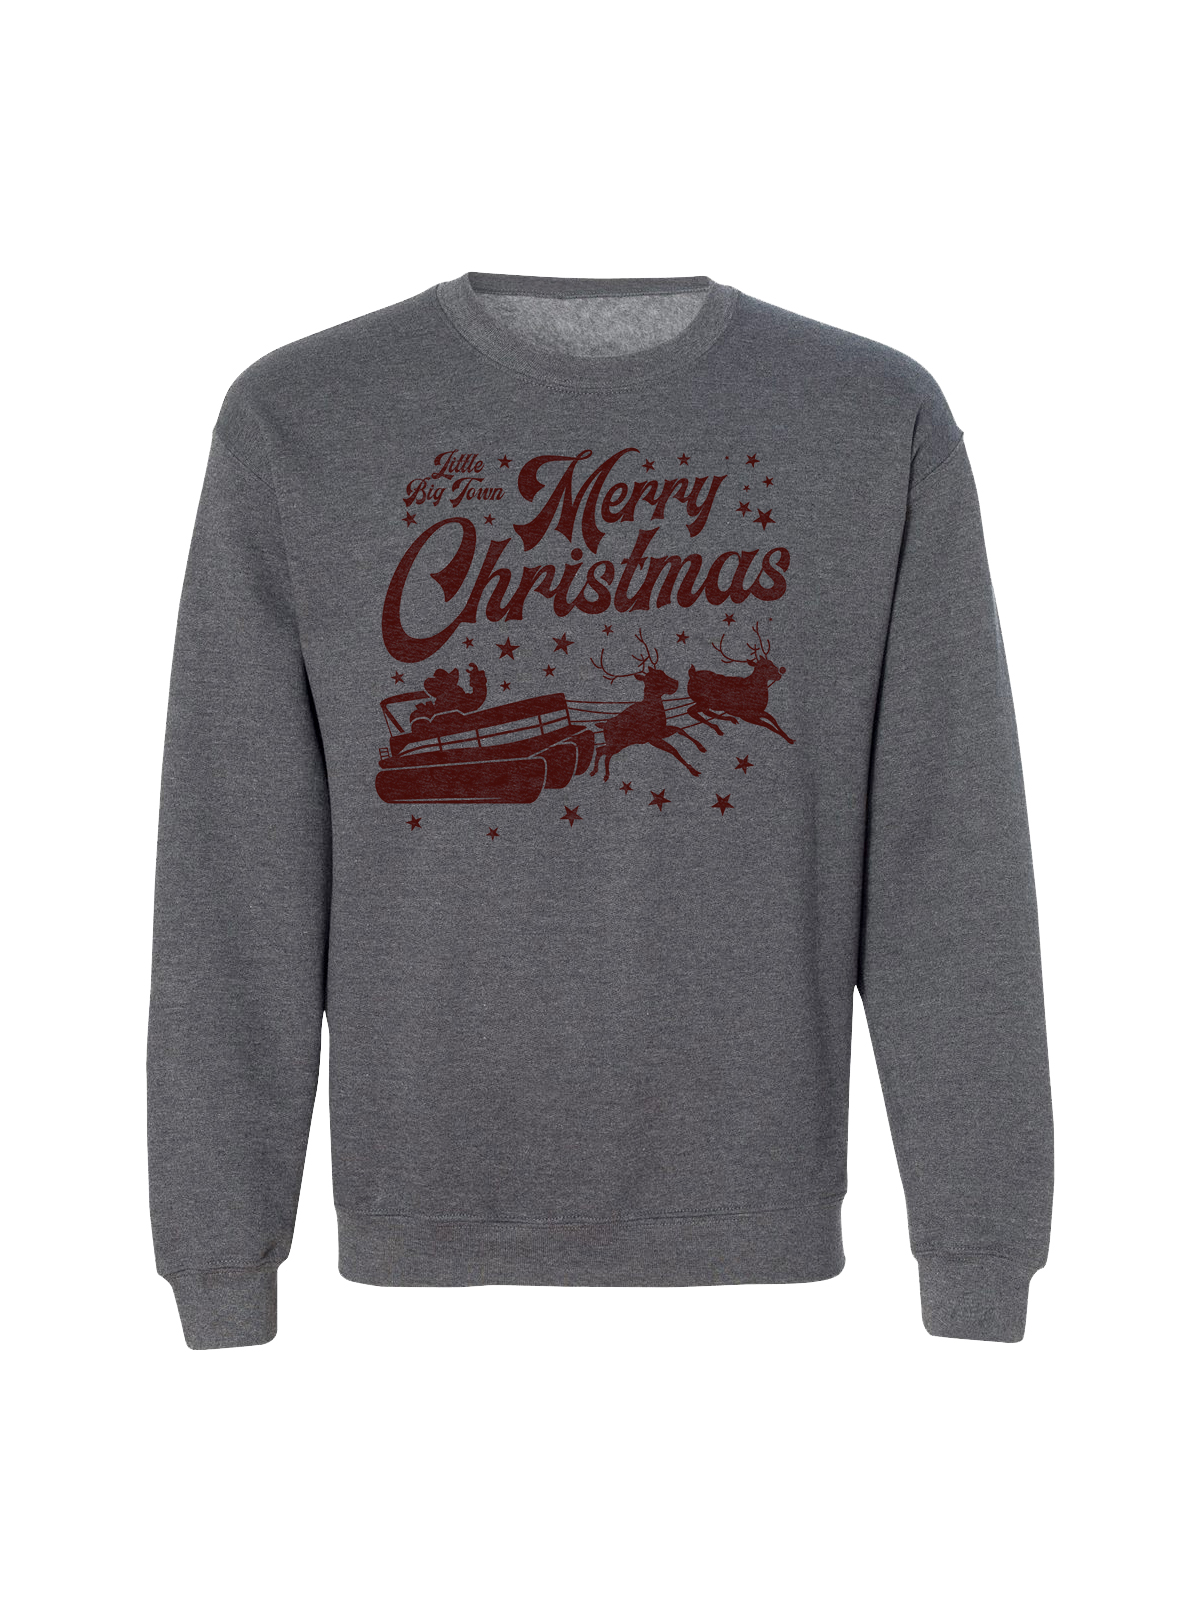 LBT Merry Christmas Crewneck Fleece